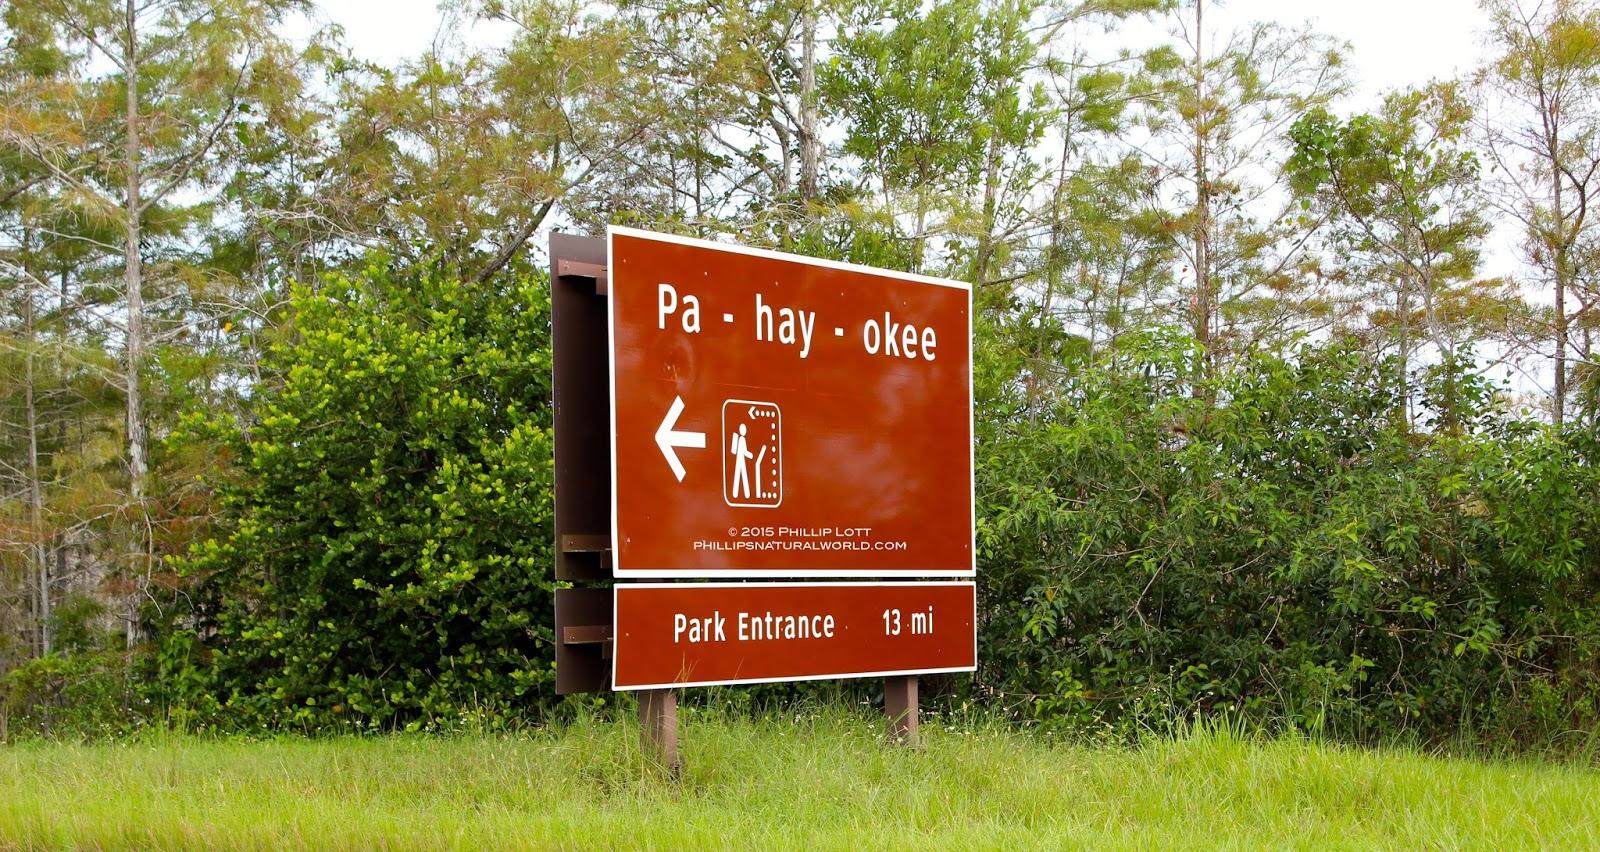 Everglades%2BNational%2BPark%2BShark%2BRiver%2BSlough%2BSeptember%2B2015%2BCopyright%2BPhillip%2BLott%2BPhillip%2527s%2BNatural%2BWorld%2BPa-hay-okee.jpg